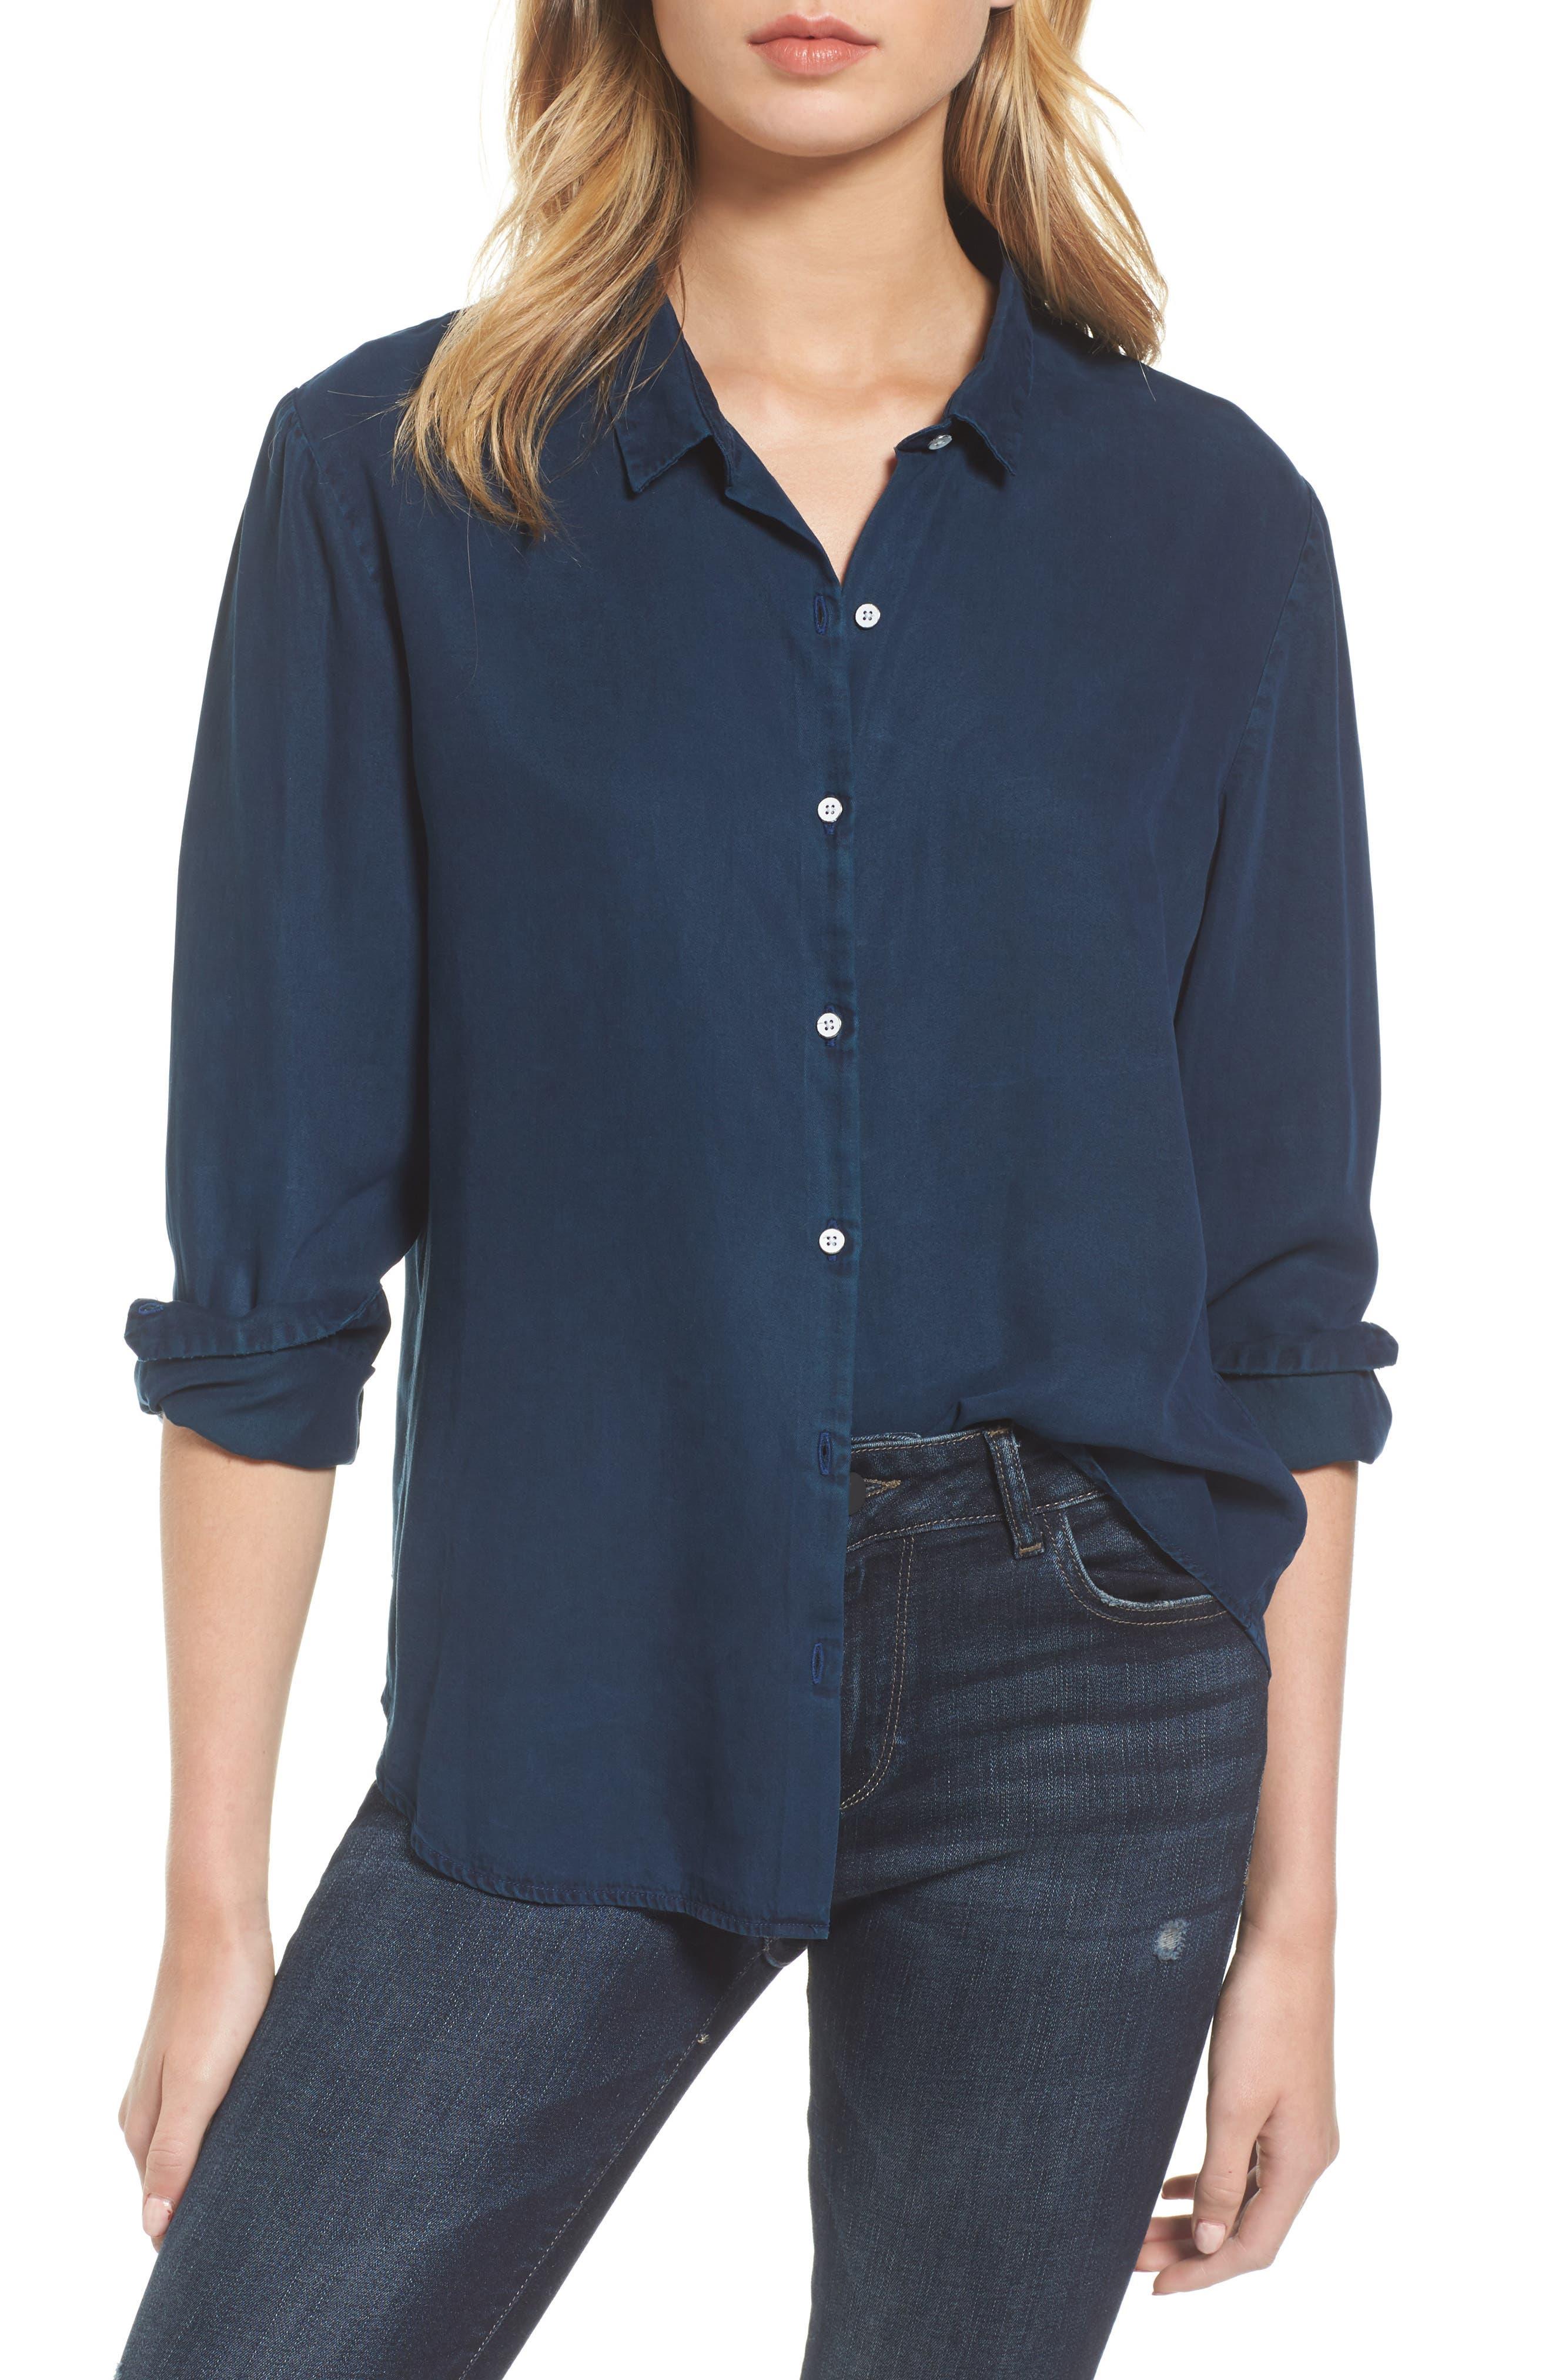 x The Blue Shirt Shop W 4th & Jane Slim Fit Shirt,                         Main,                         color, Indigo Overdye